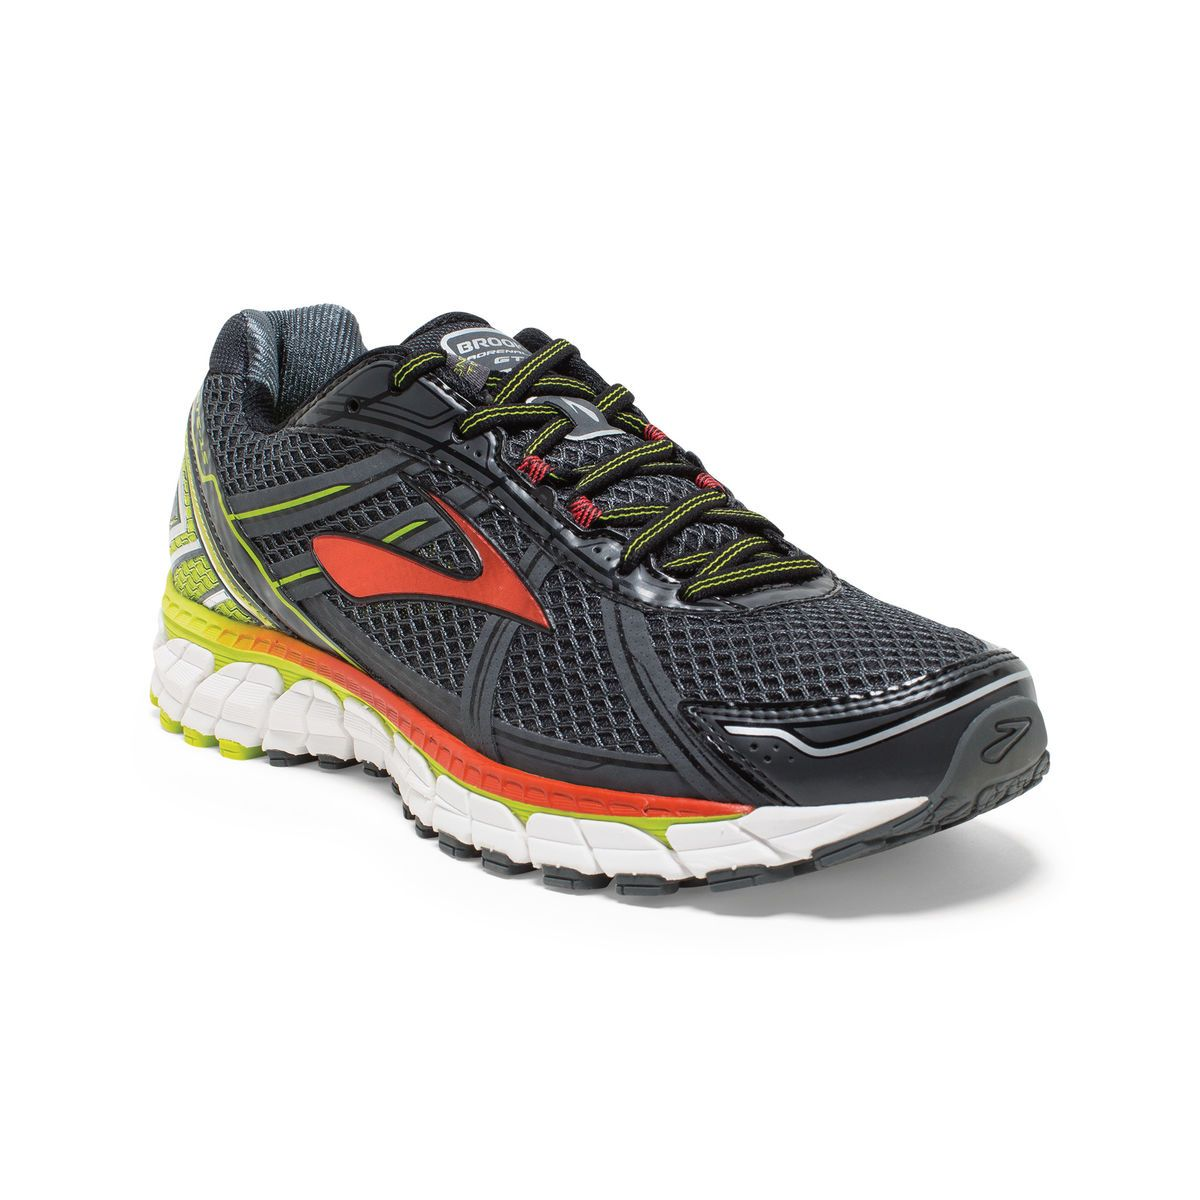 f619269cebb3f9 Brooks Adrenaline GTS 15 Men s Running Shoes